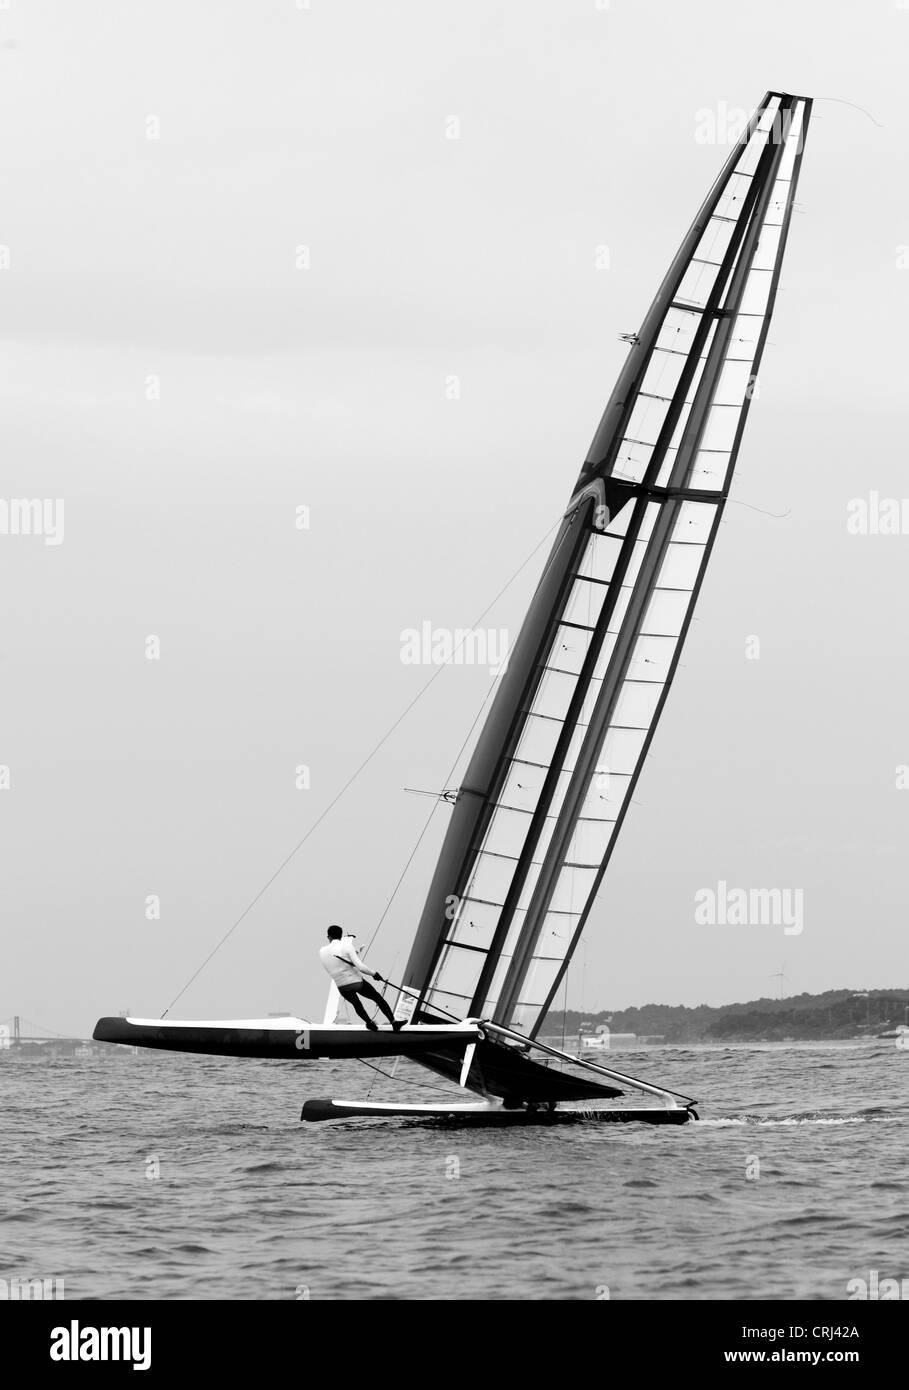 La classe C International Championnats du catamaran (IC4) a organisé à New York Yacht Club de Newport, RI du 22 au 28 août 2010. E Banque D'Images